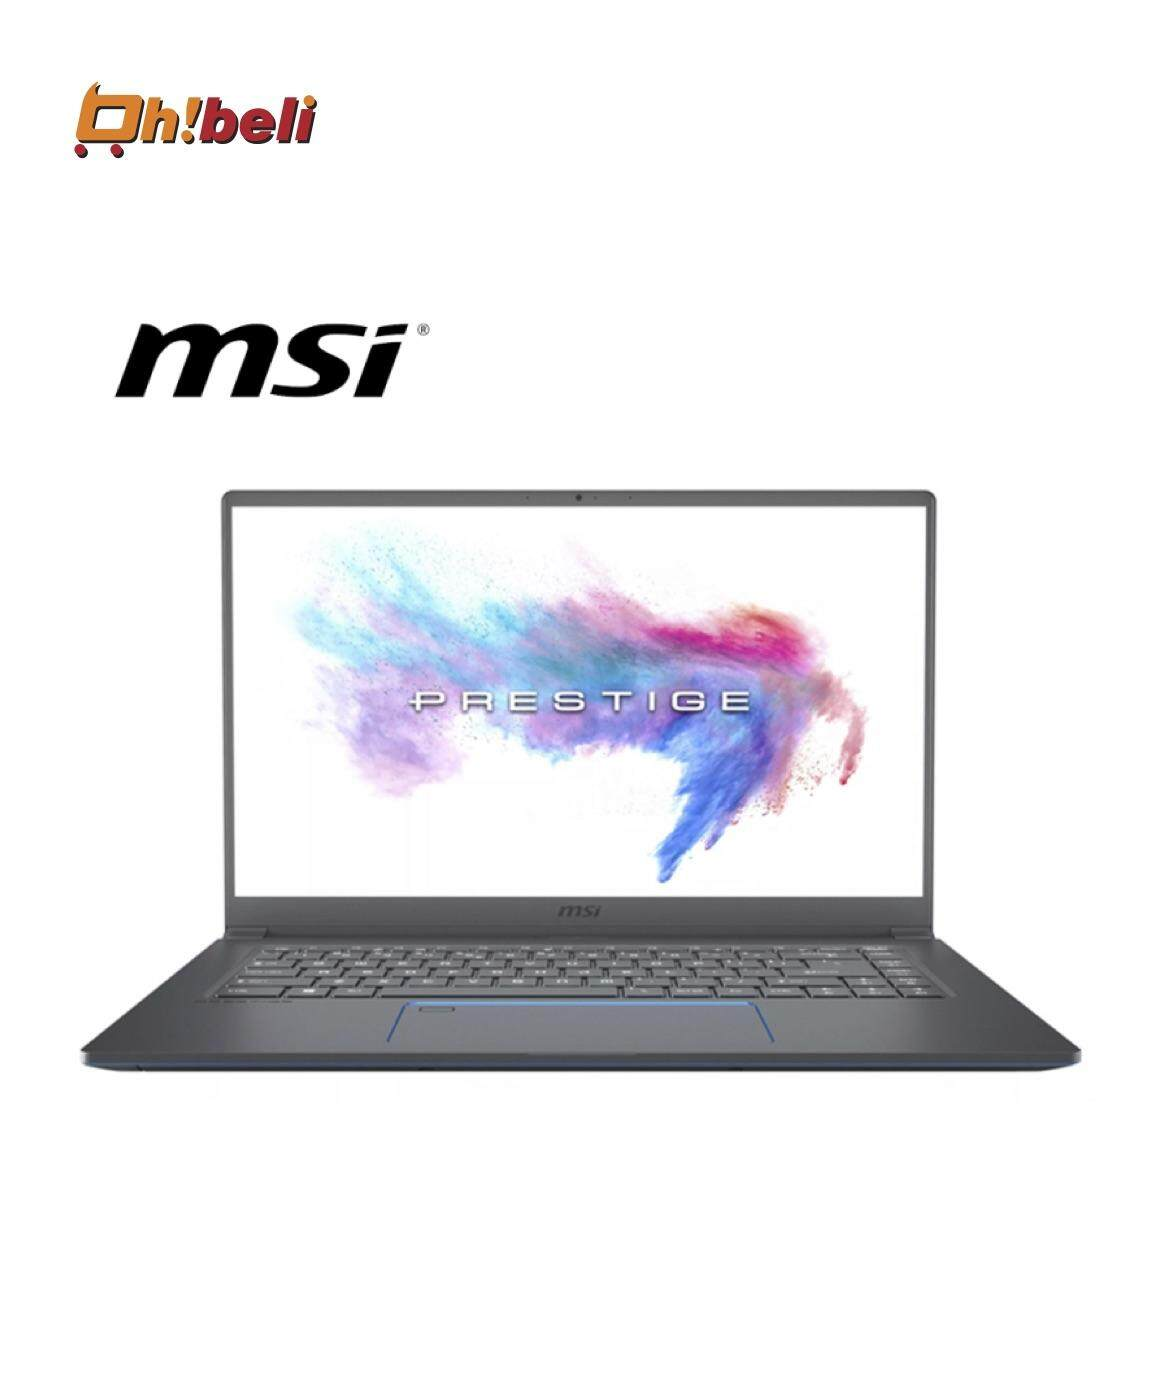 MSI Modern PS63 8RD-267 15.6 FHD IPS Laptop (I7-8565U/8GB/512GB/GTX1050Ti 4GB Max-Q/W10) (ohbeli) Malaysia